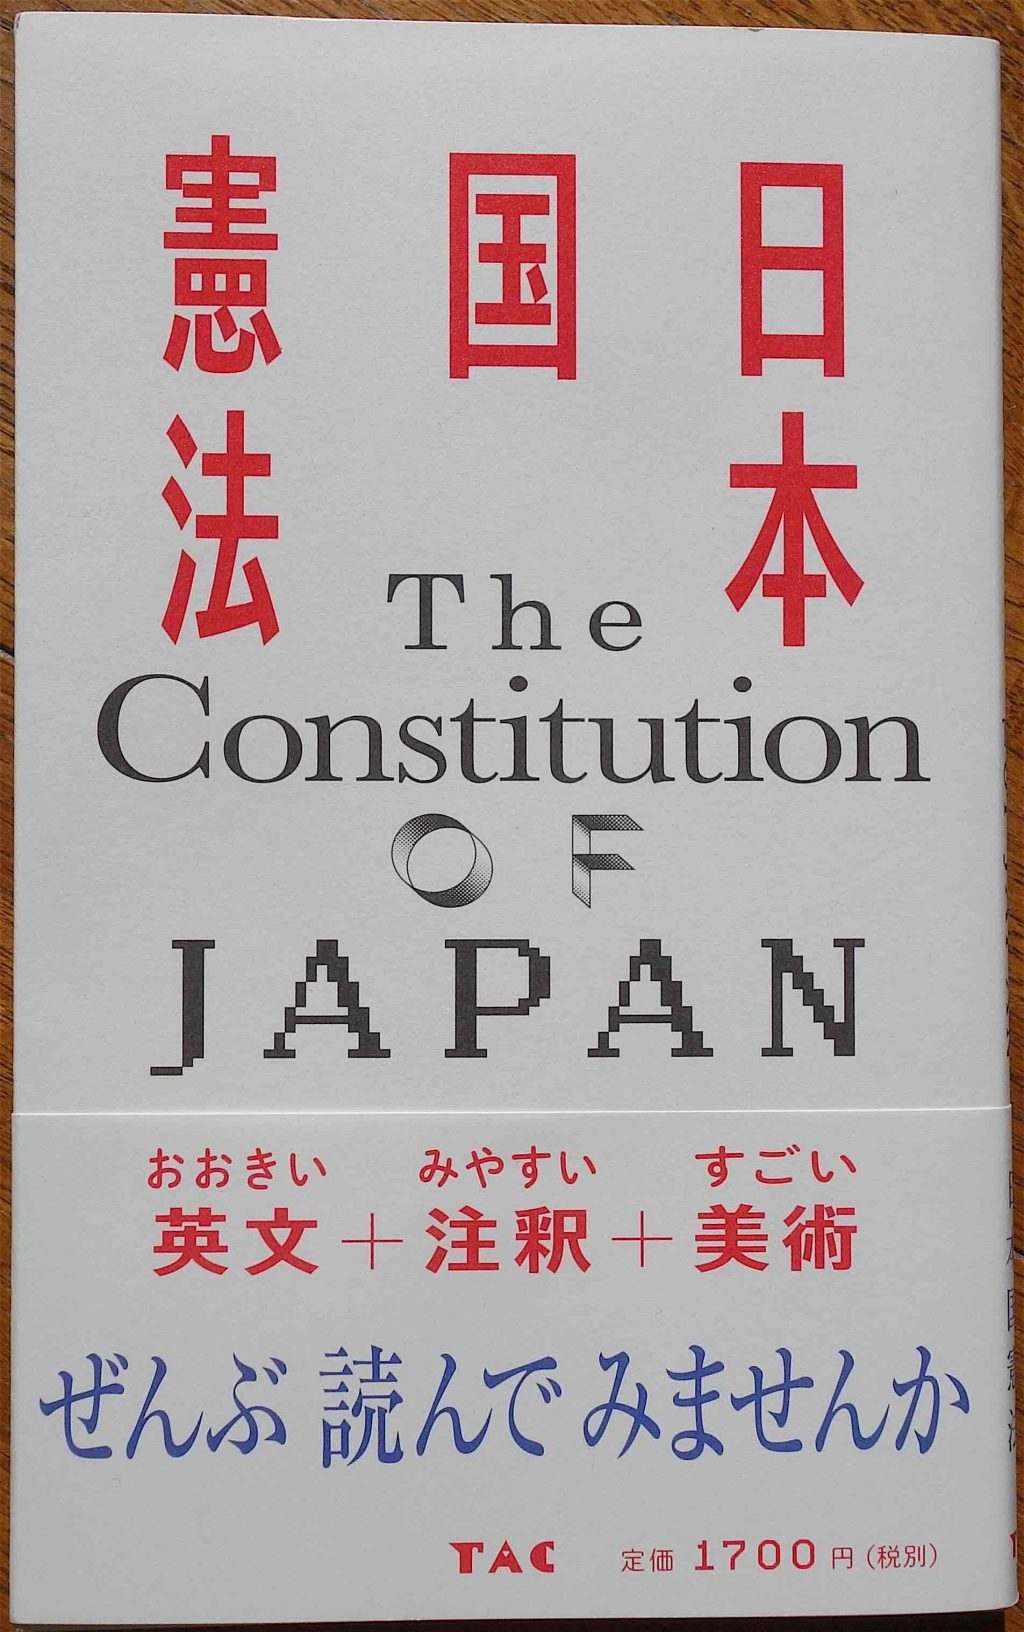 日本国憲法 The Constitution of Japan 松本 弦人 編 、TAC出版 2019年